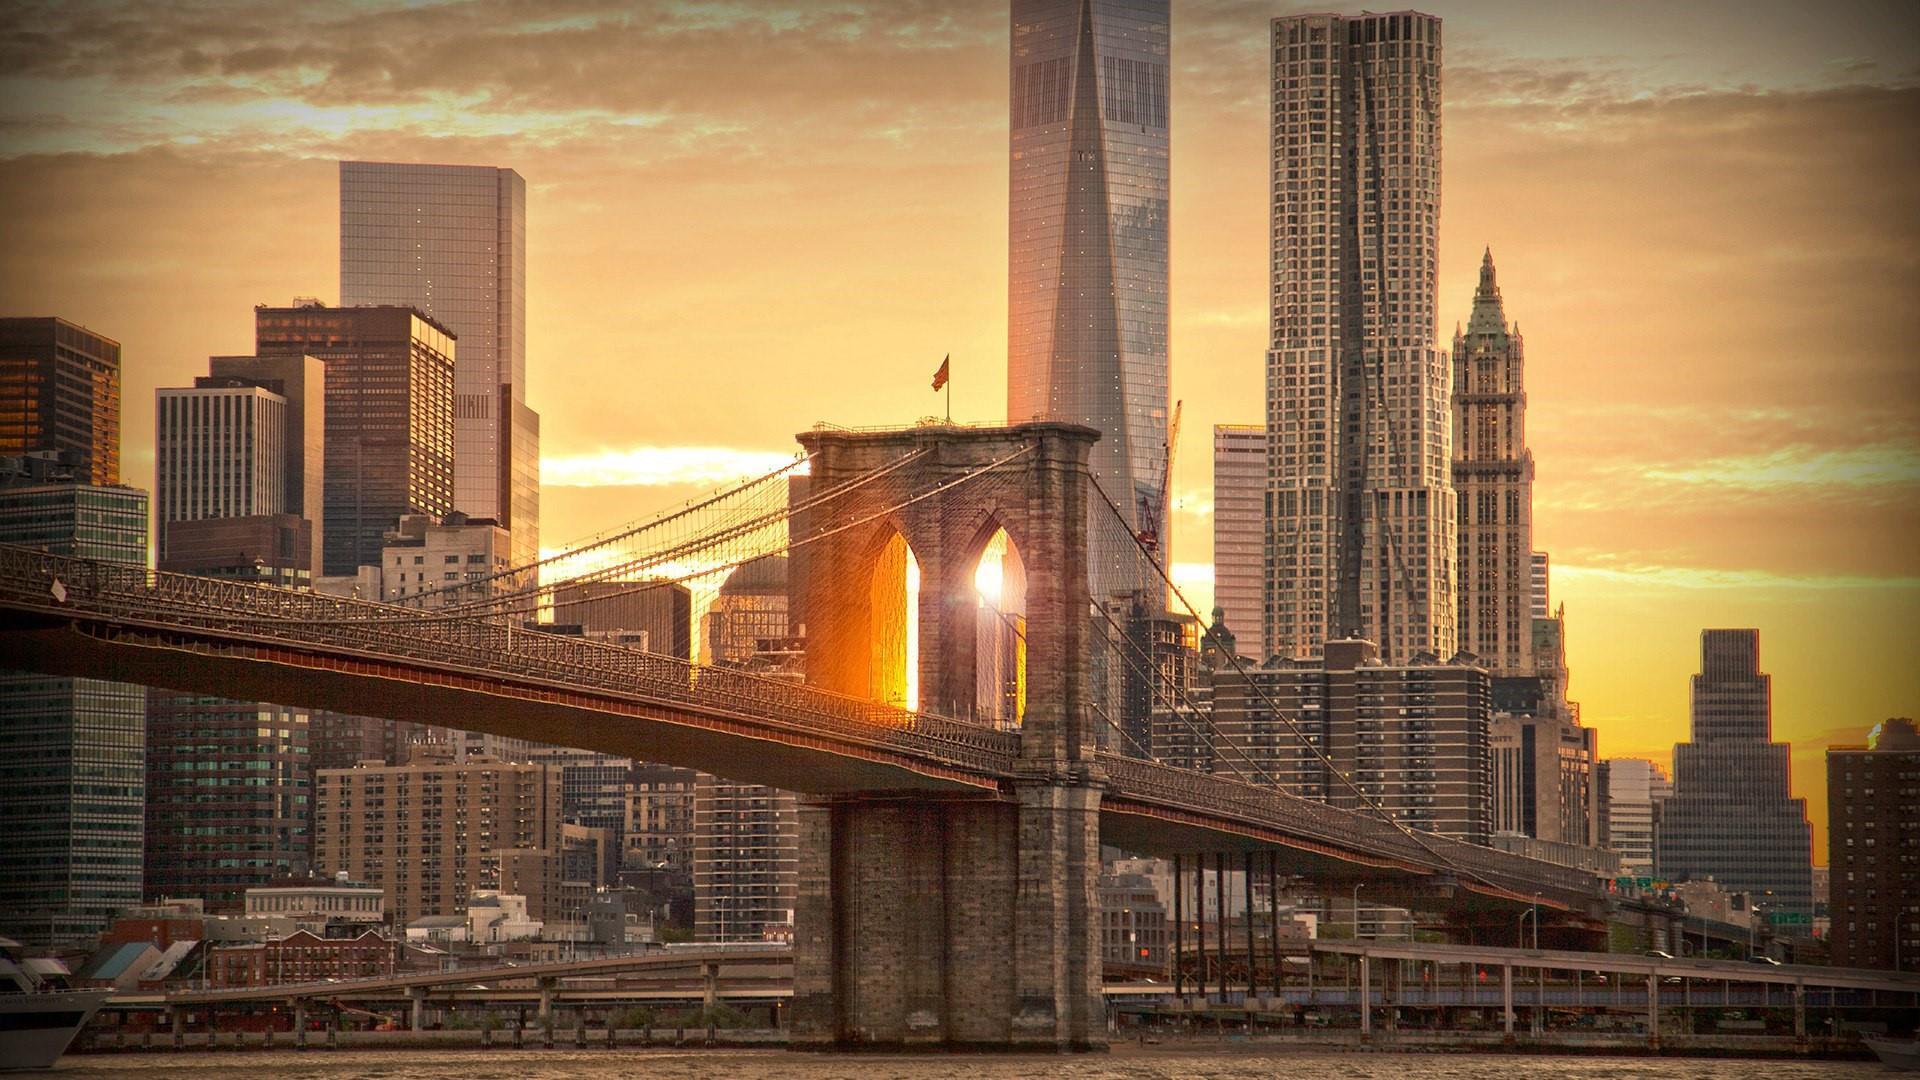 Brooklyn Bridge Wallpapers Top Free Brooklyn Bridge